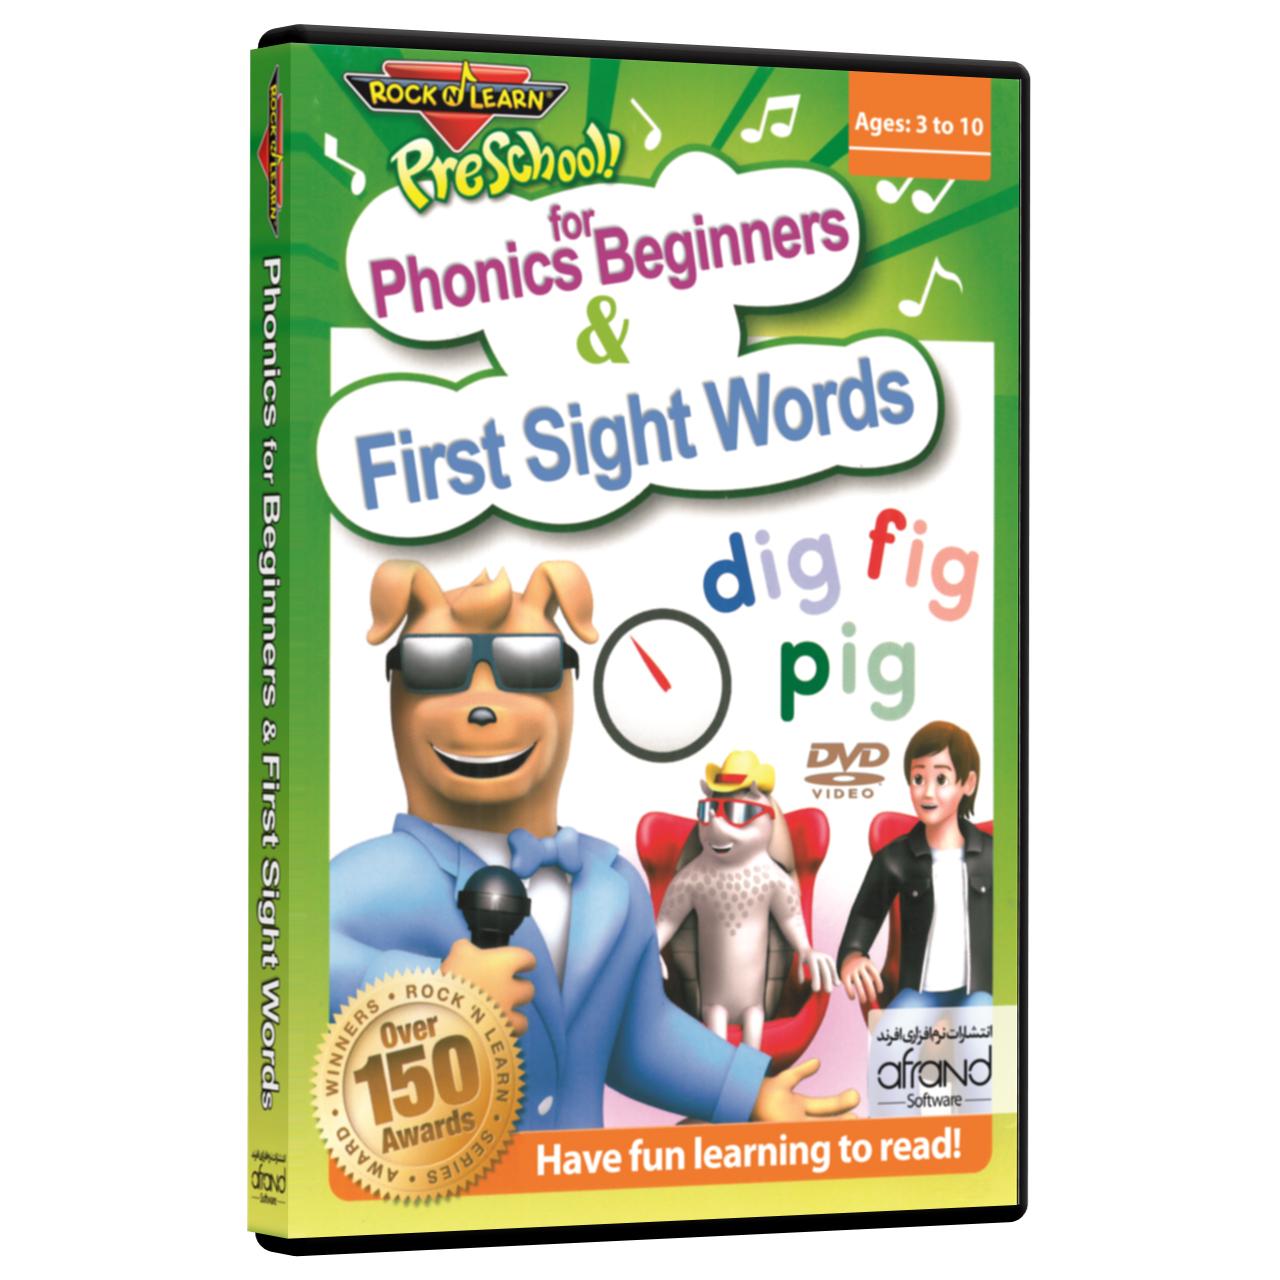 فیلم آموزش زبان انگلیسی RockNLearn Phonics for Beginners & First Sight Words انتشارات نرم افزاری افرند